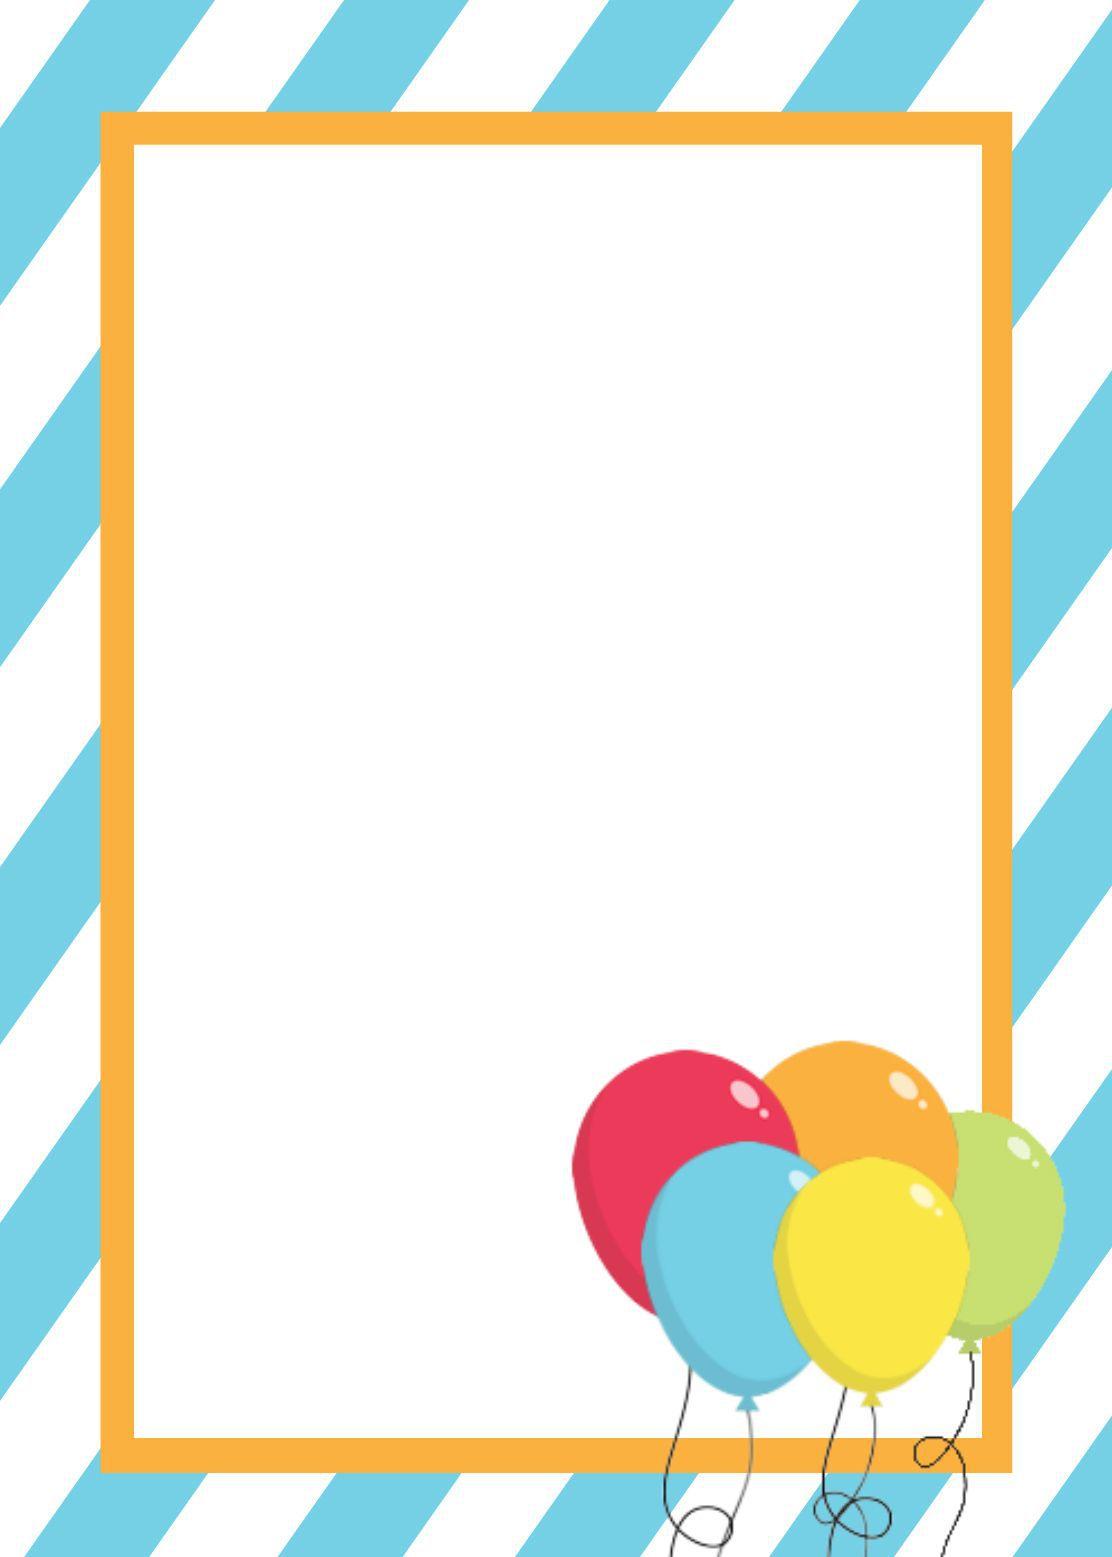 000 Breathtaking Free Invite Design Printable Photo  Wedding Place Card Template Birthday To PrintFull